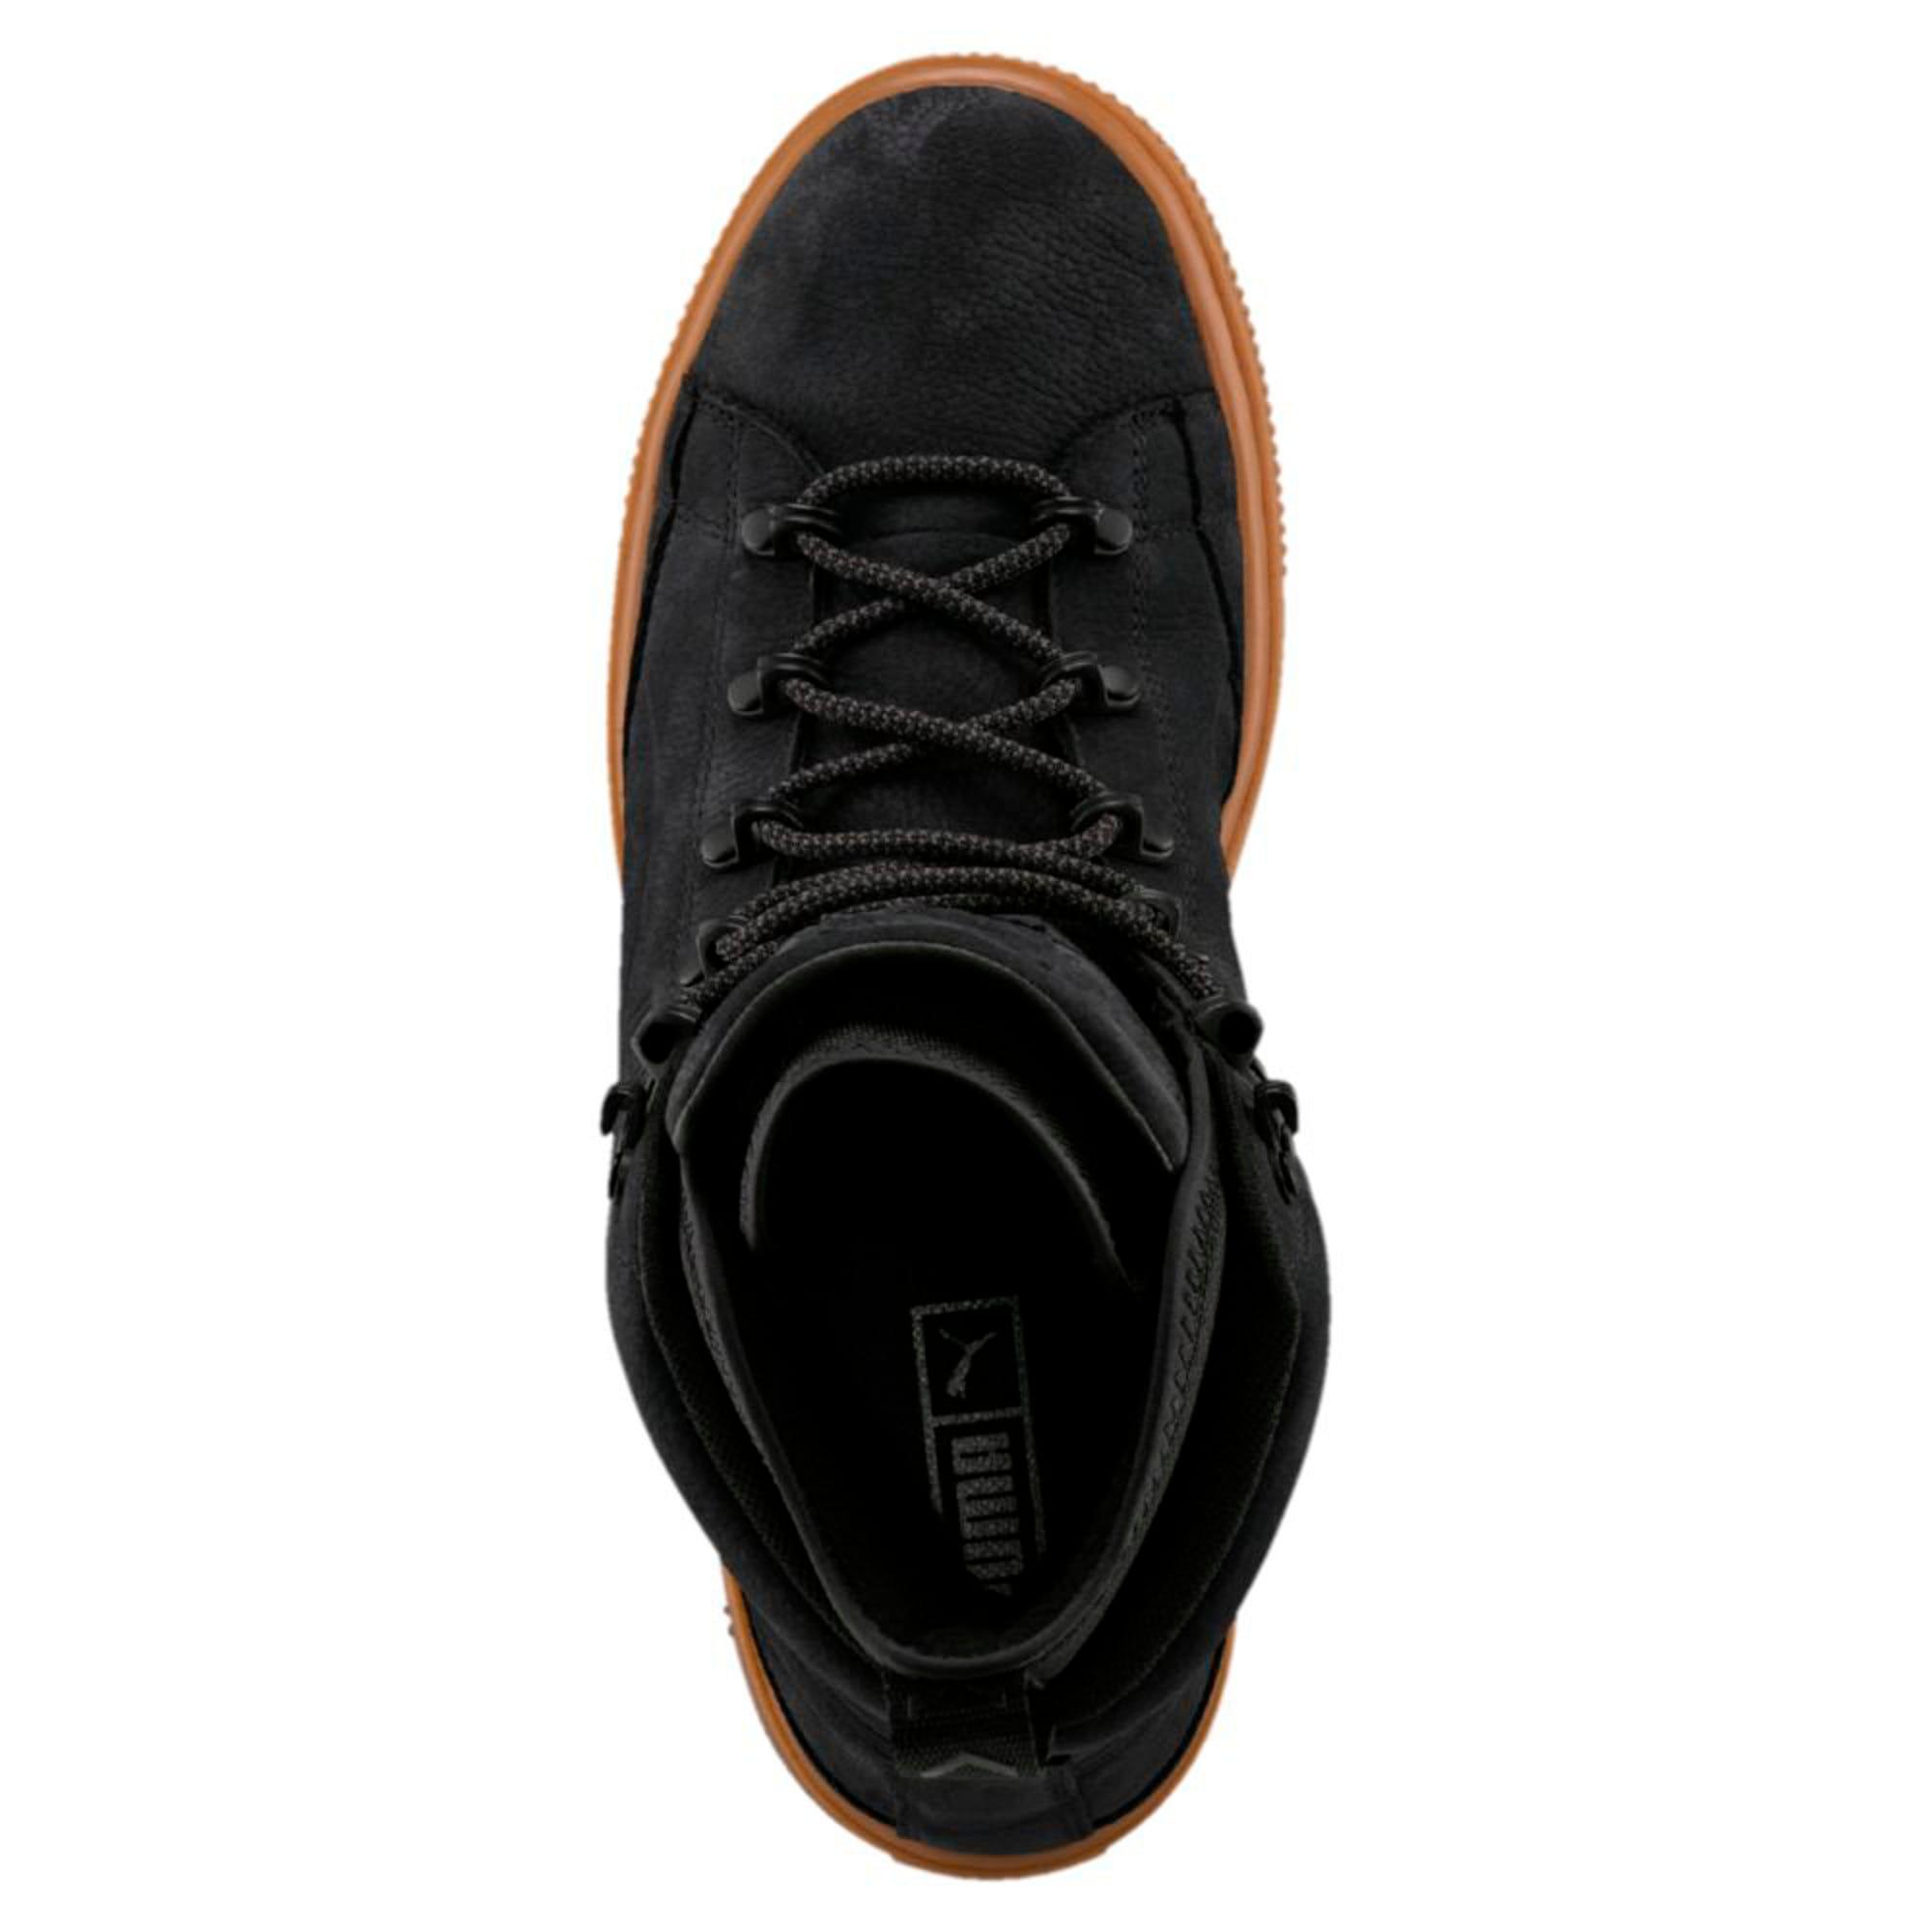 Thumbnail 5 of The Ren Boots, Puma Black, medium-IND